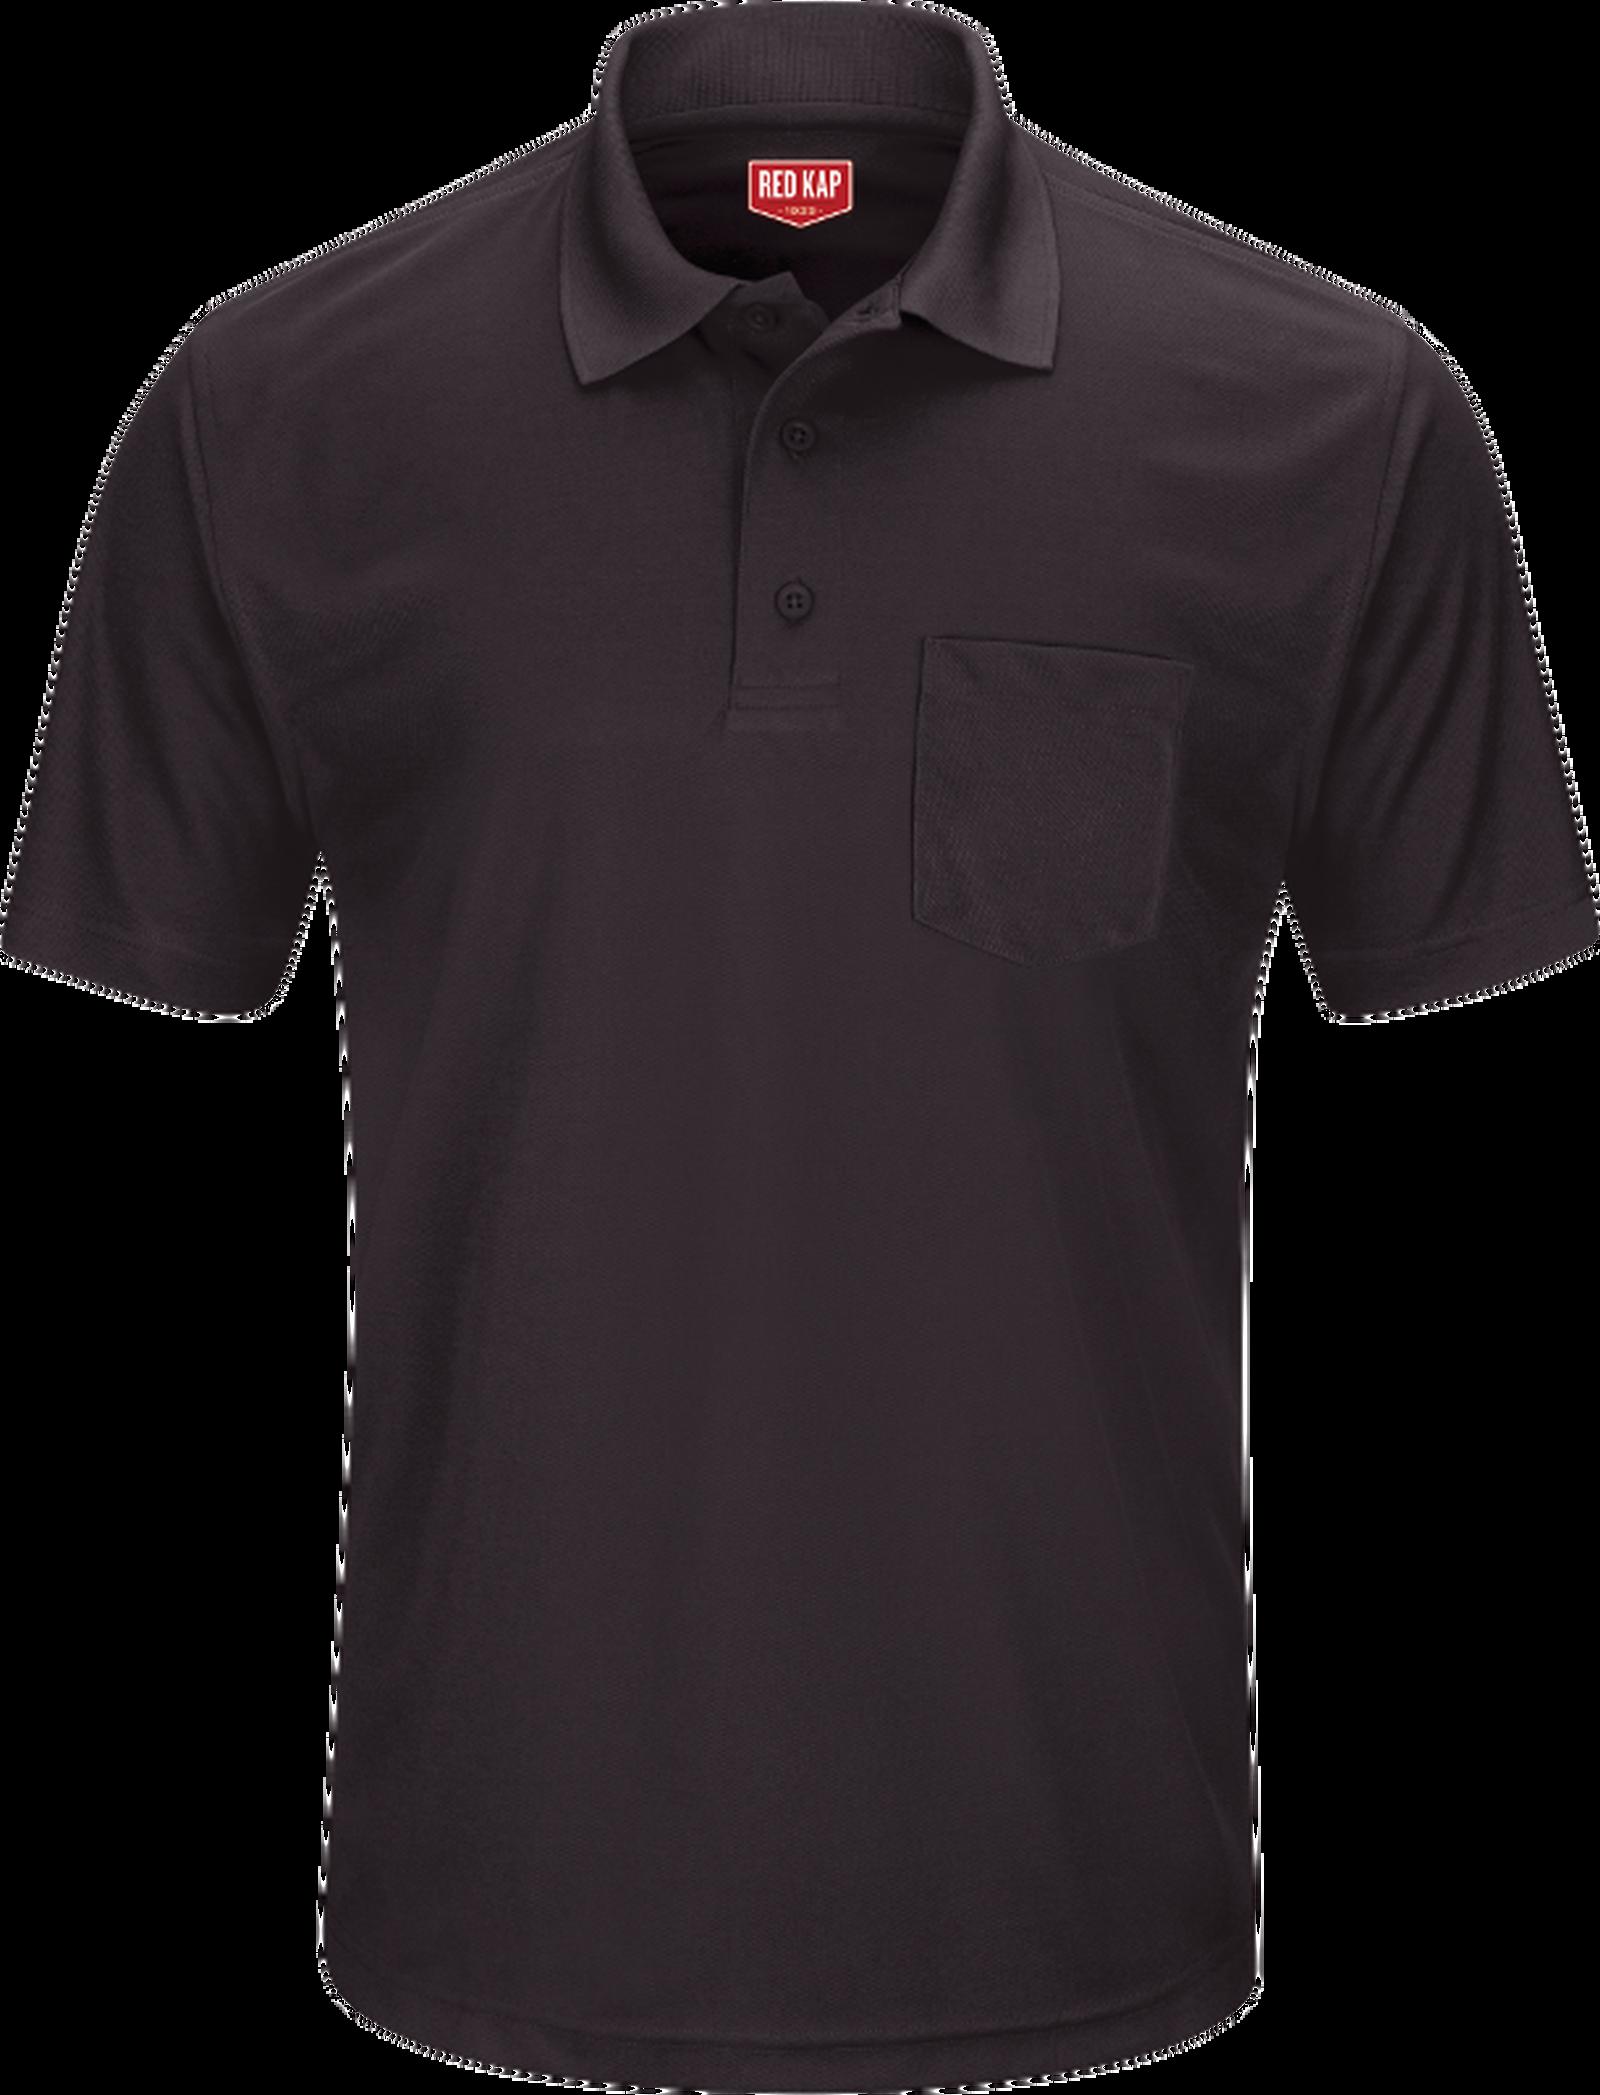 Men's Short Sleeve Performance Knit® PocketPolo